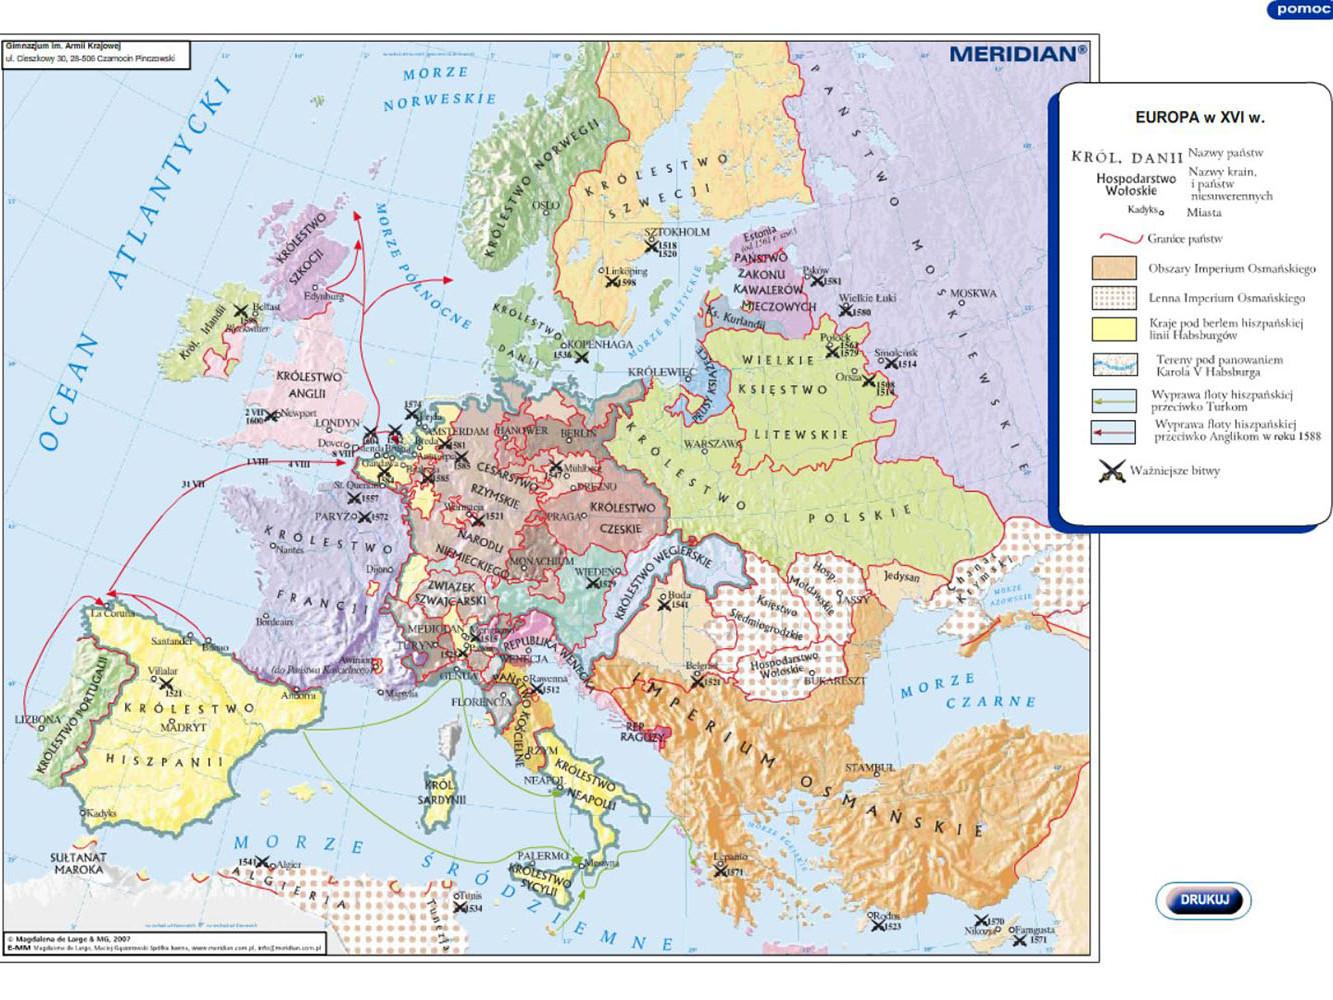 Europa w XVIw